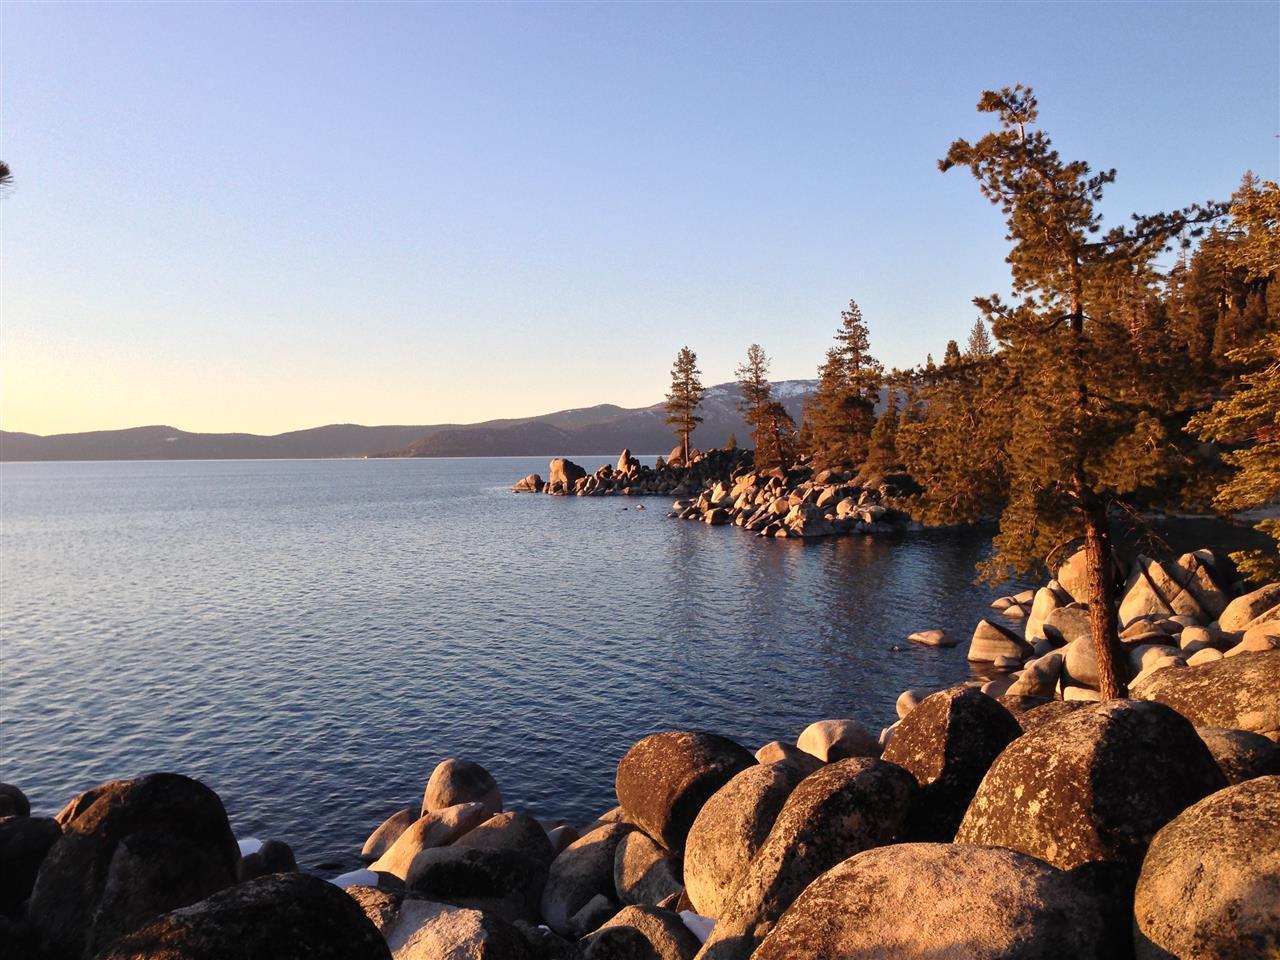 North Shore Lake Tahoe, Incline Village, NV